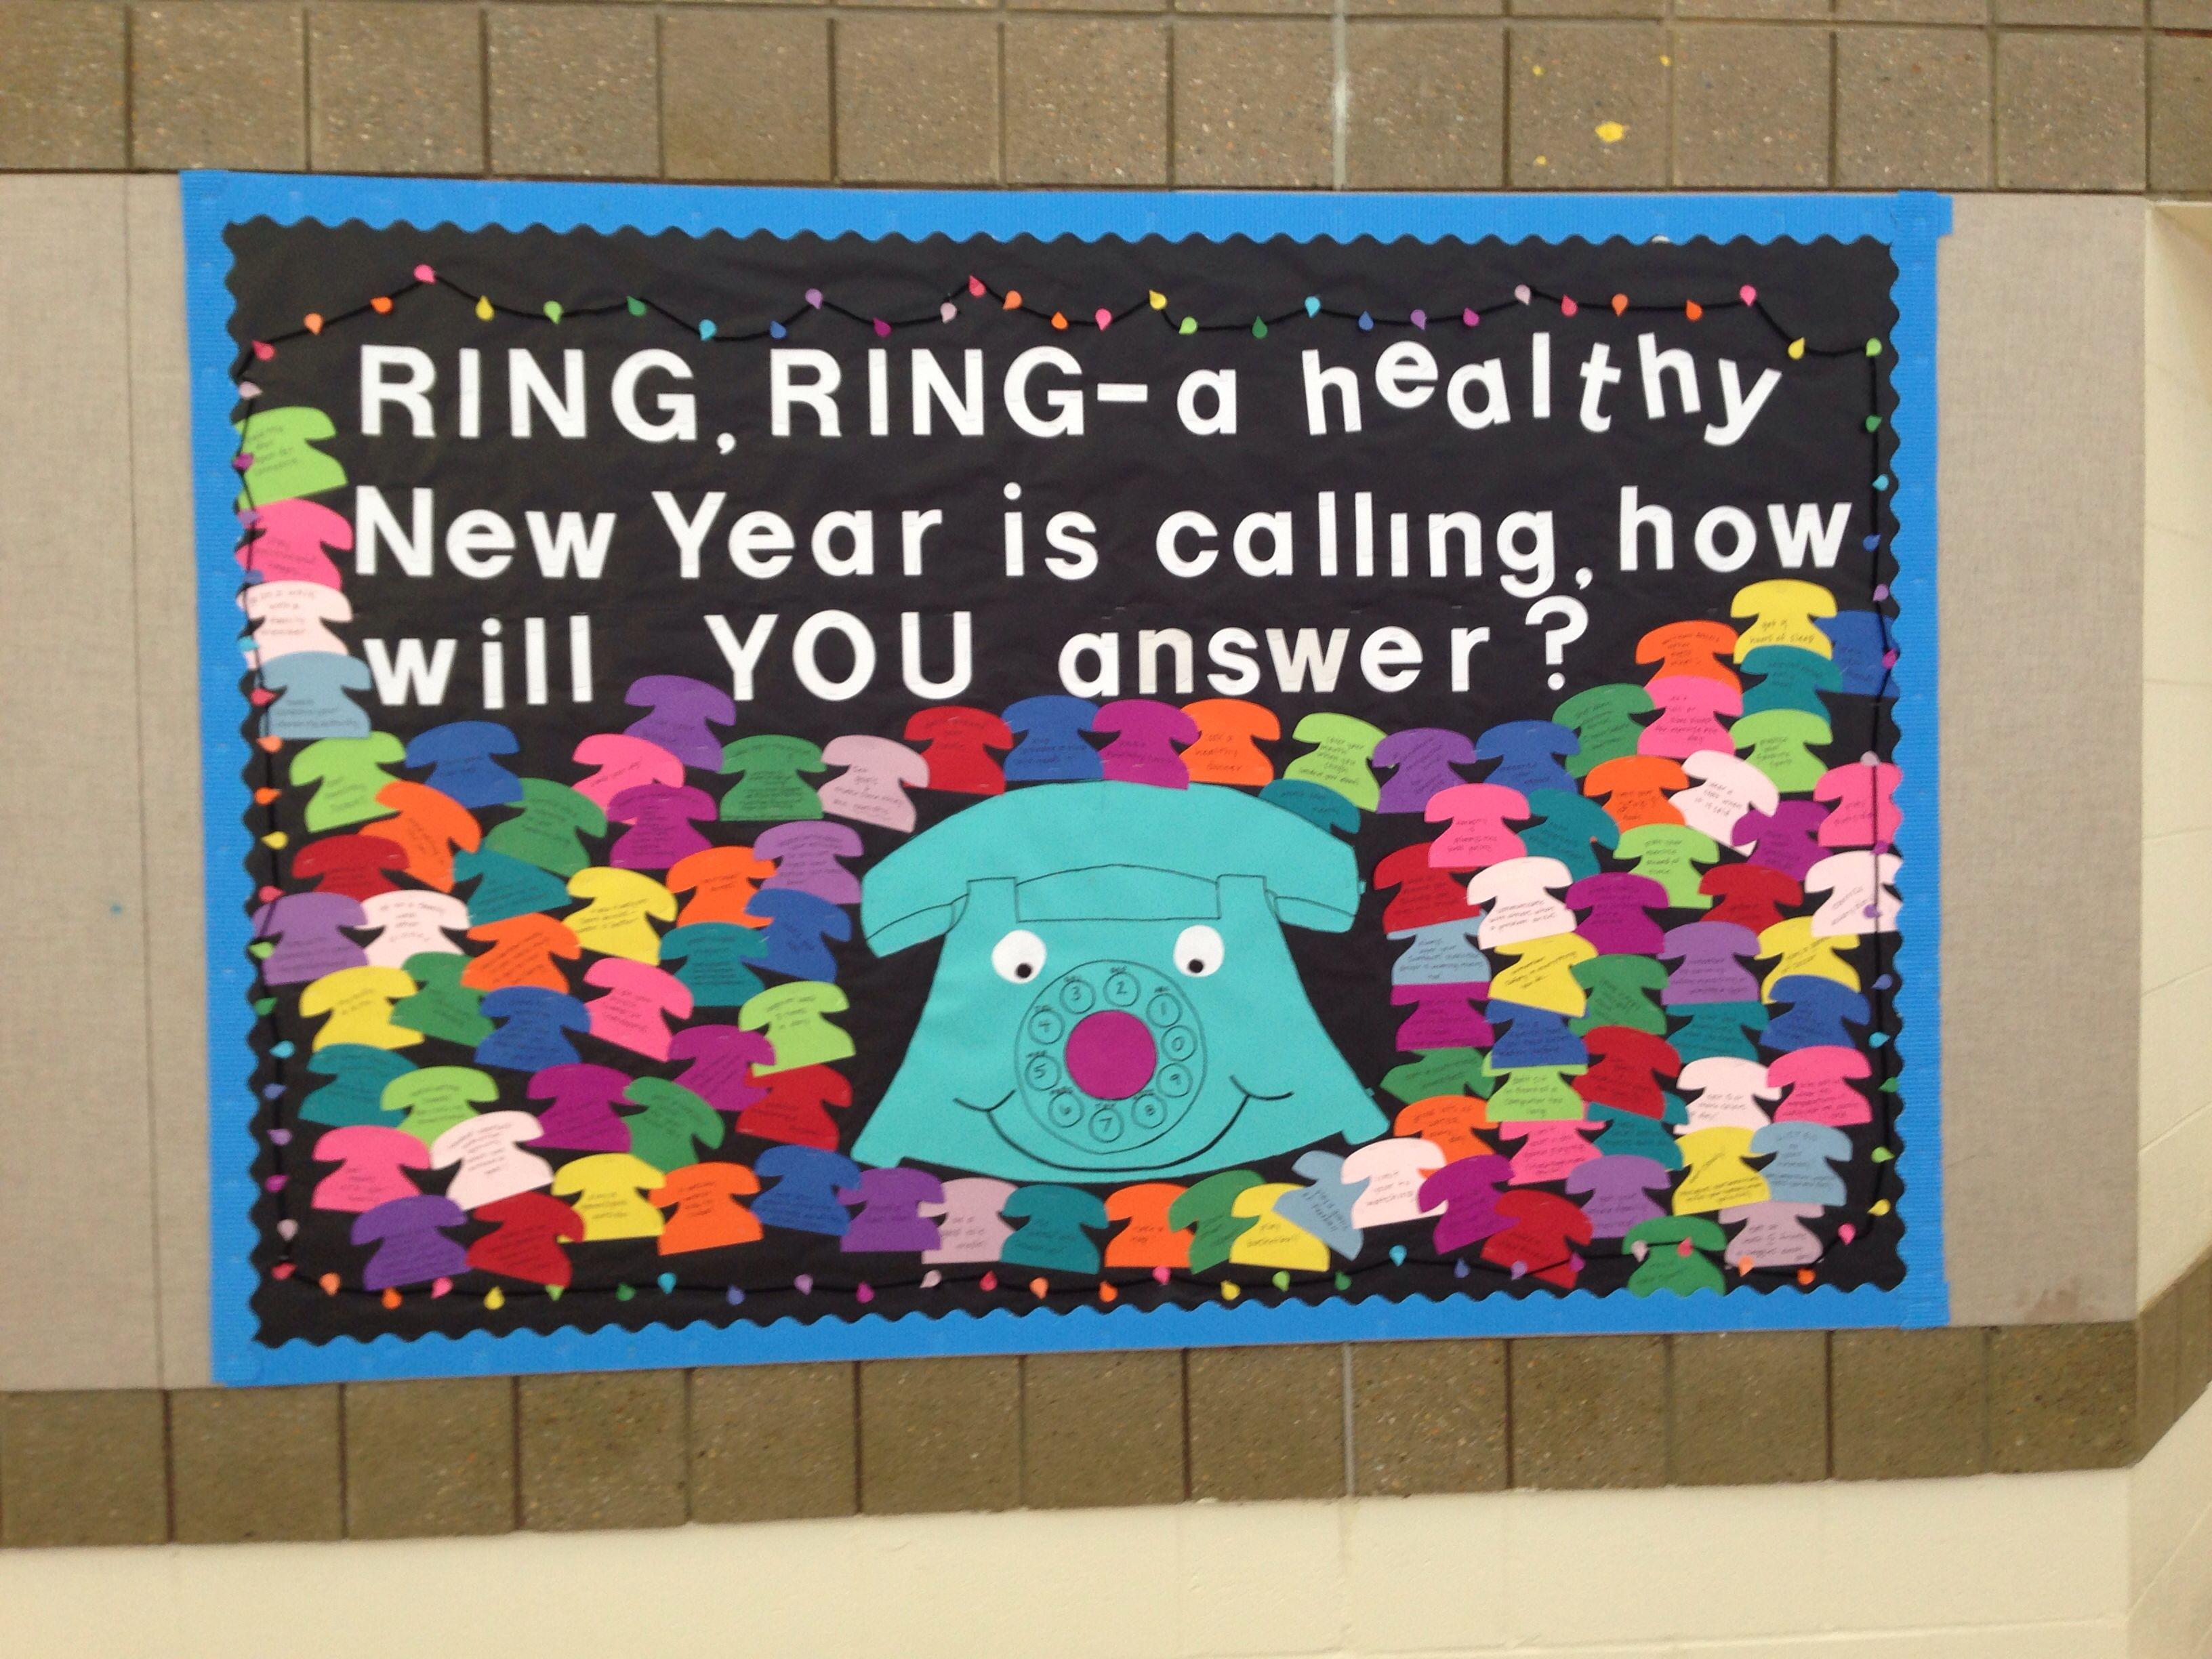 New Year health/PE bulletin board each phone has a